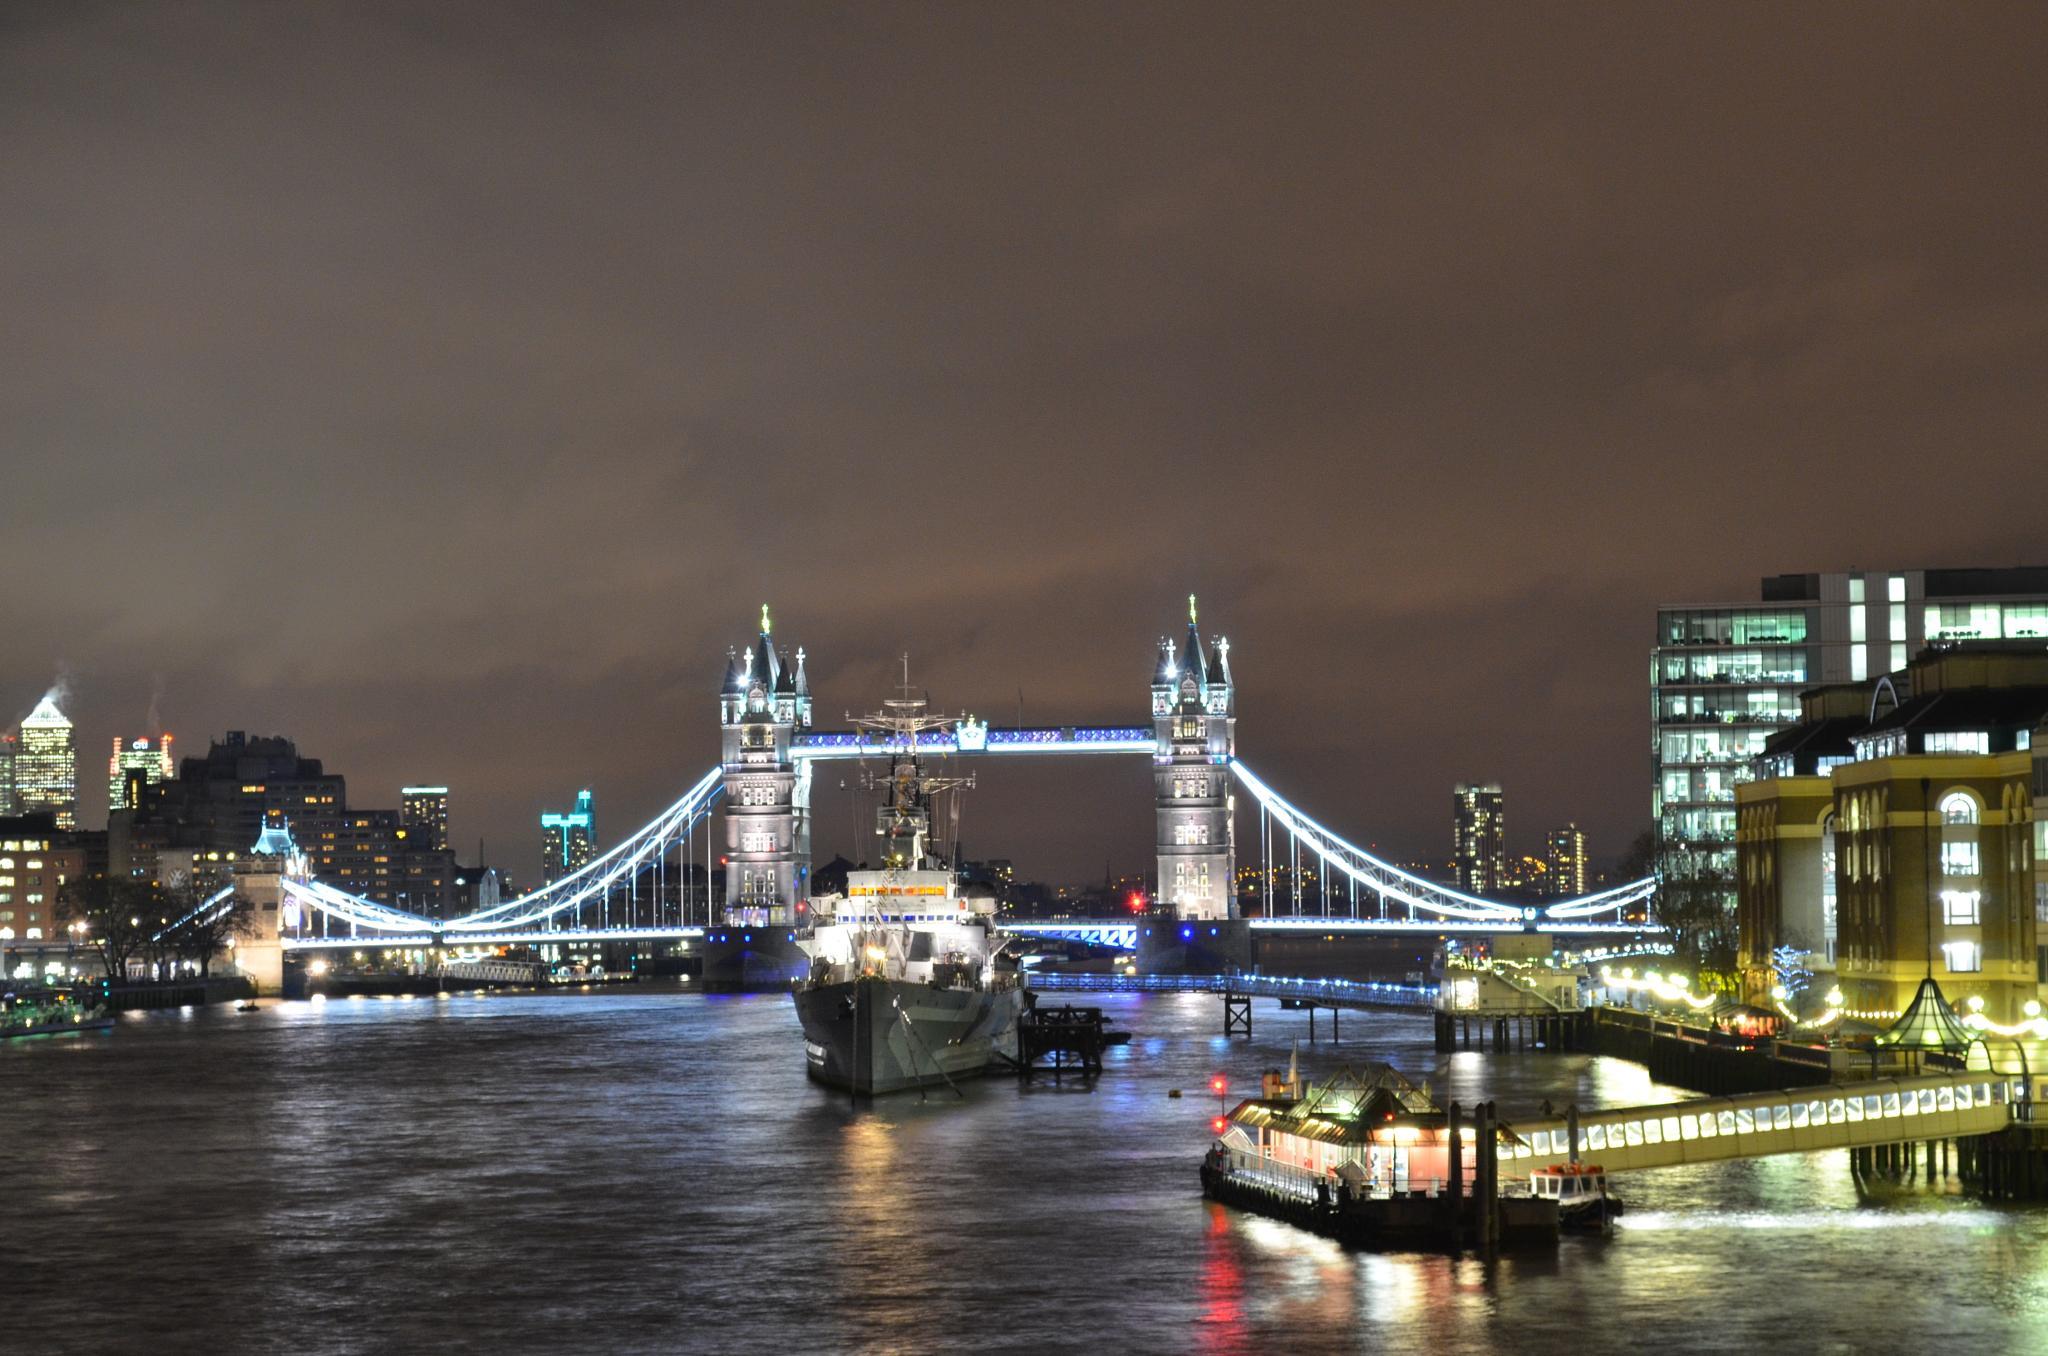 London by Kypros Kyprianou